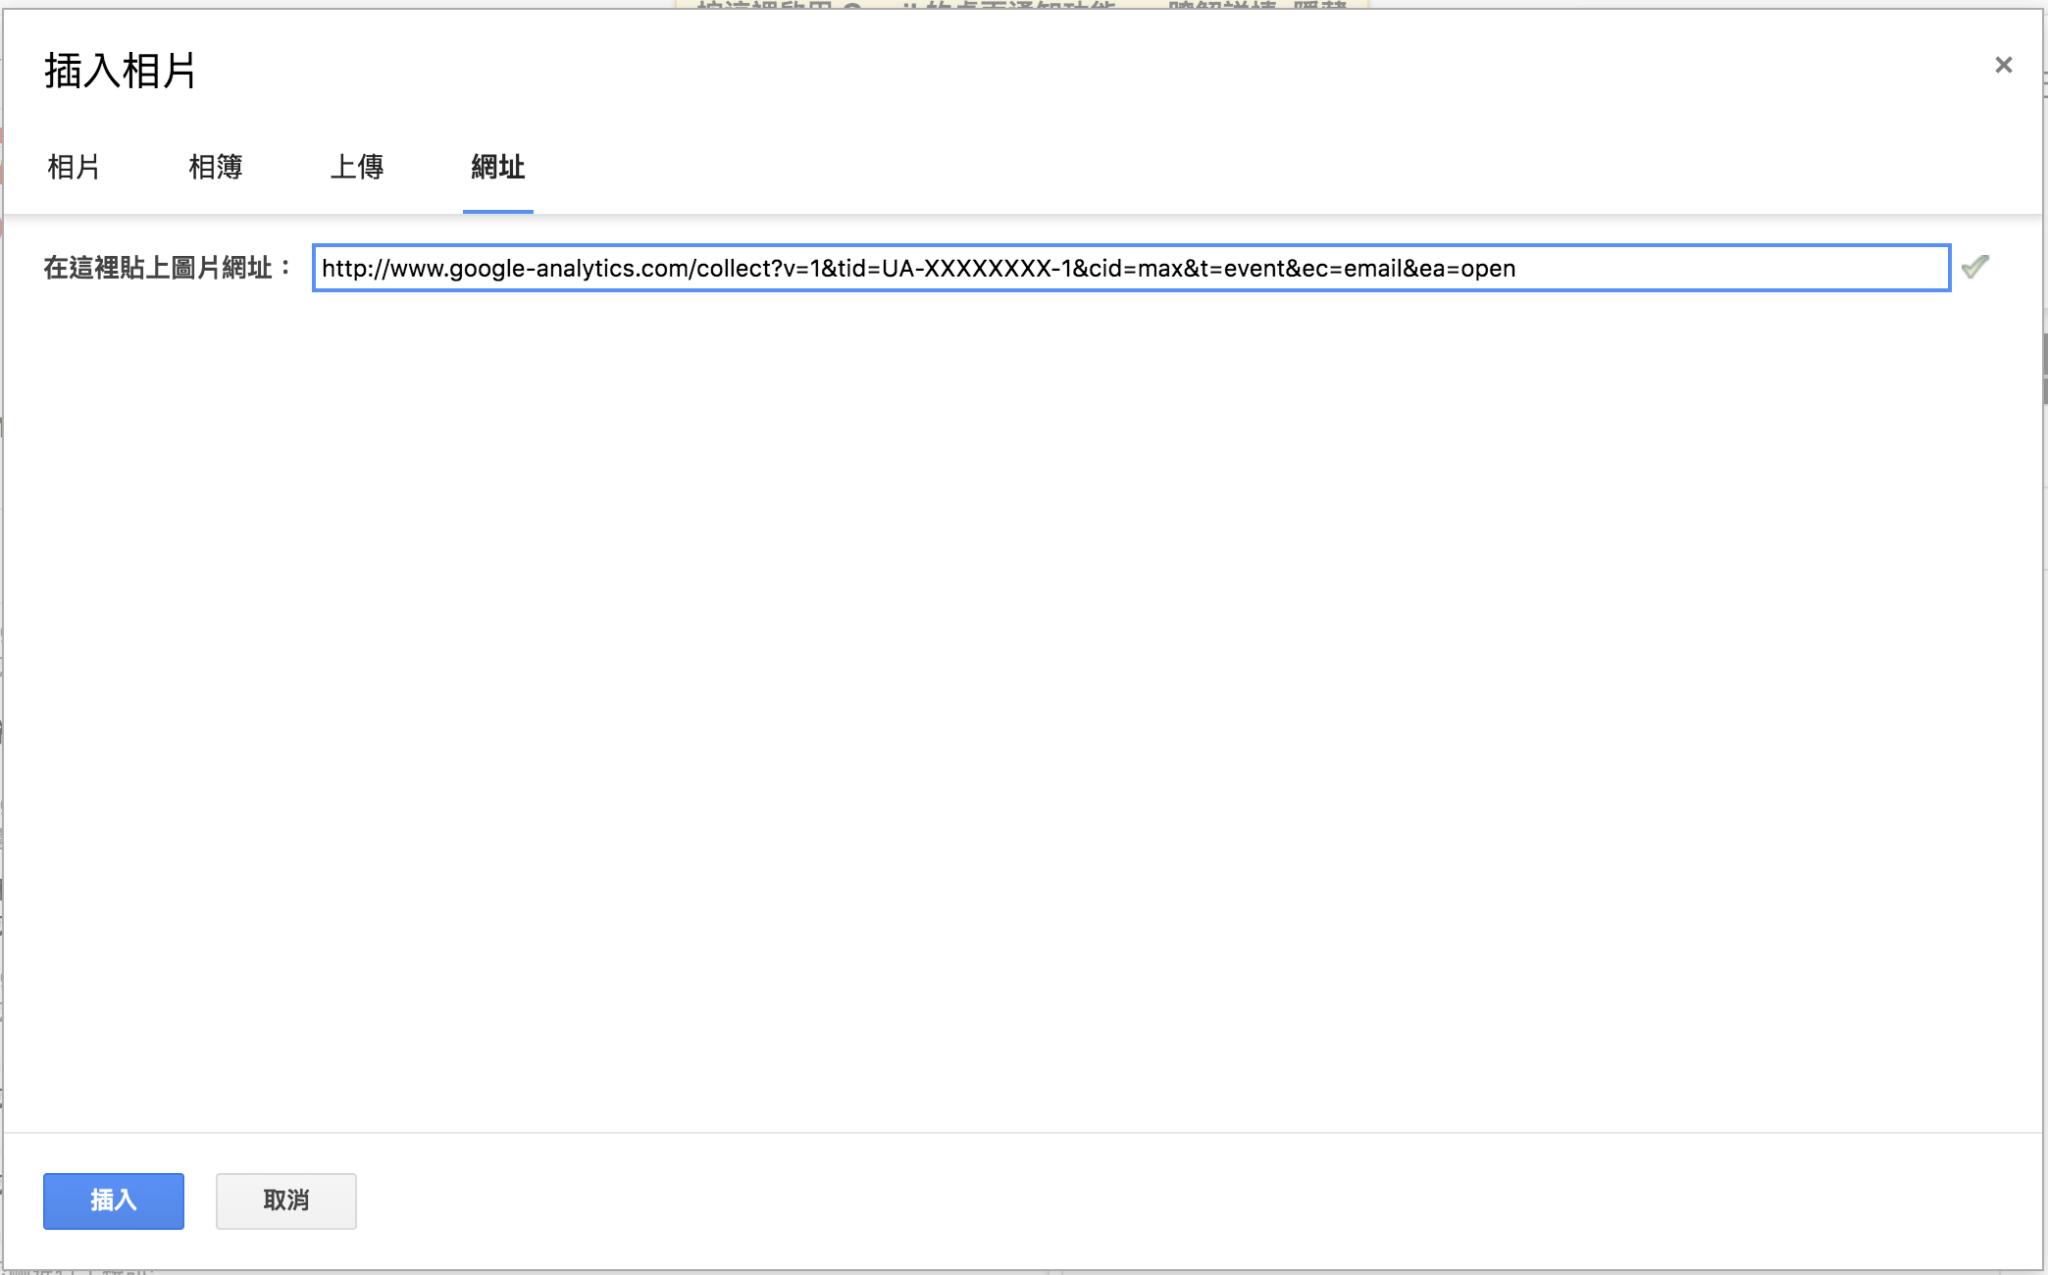 GoogleAnalyticsEmail